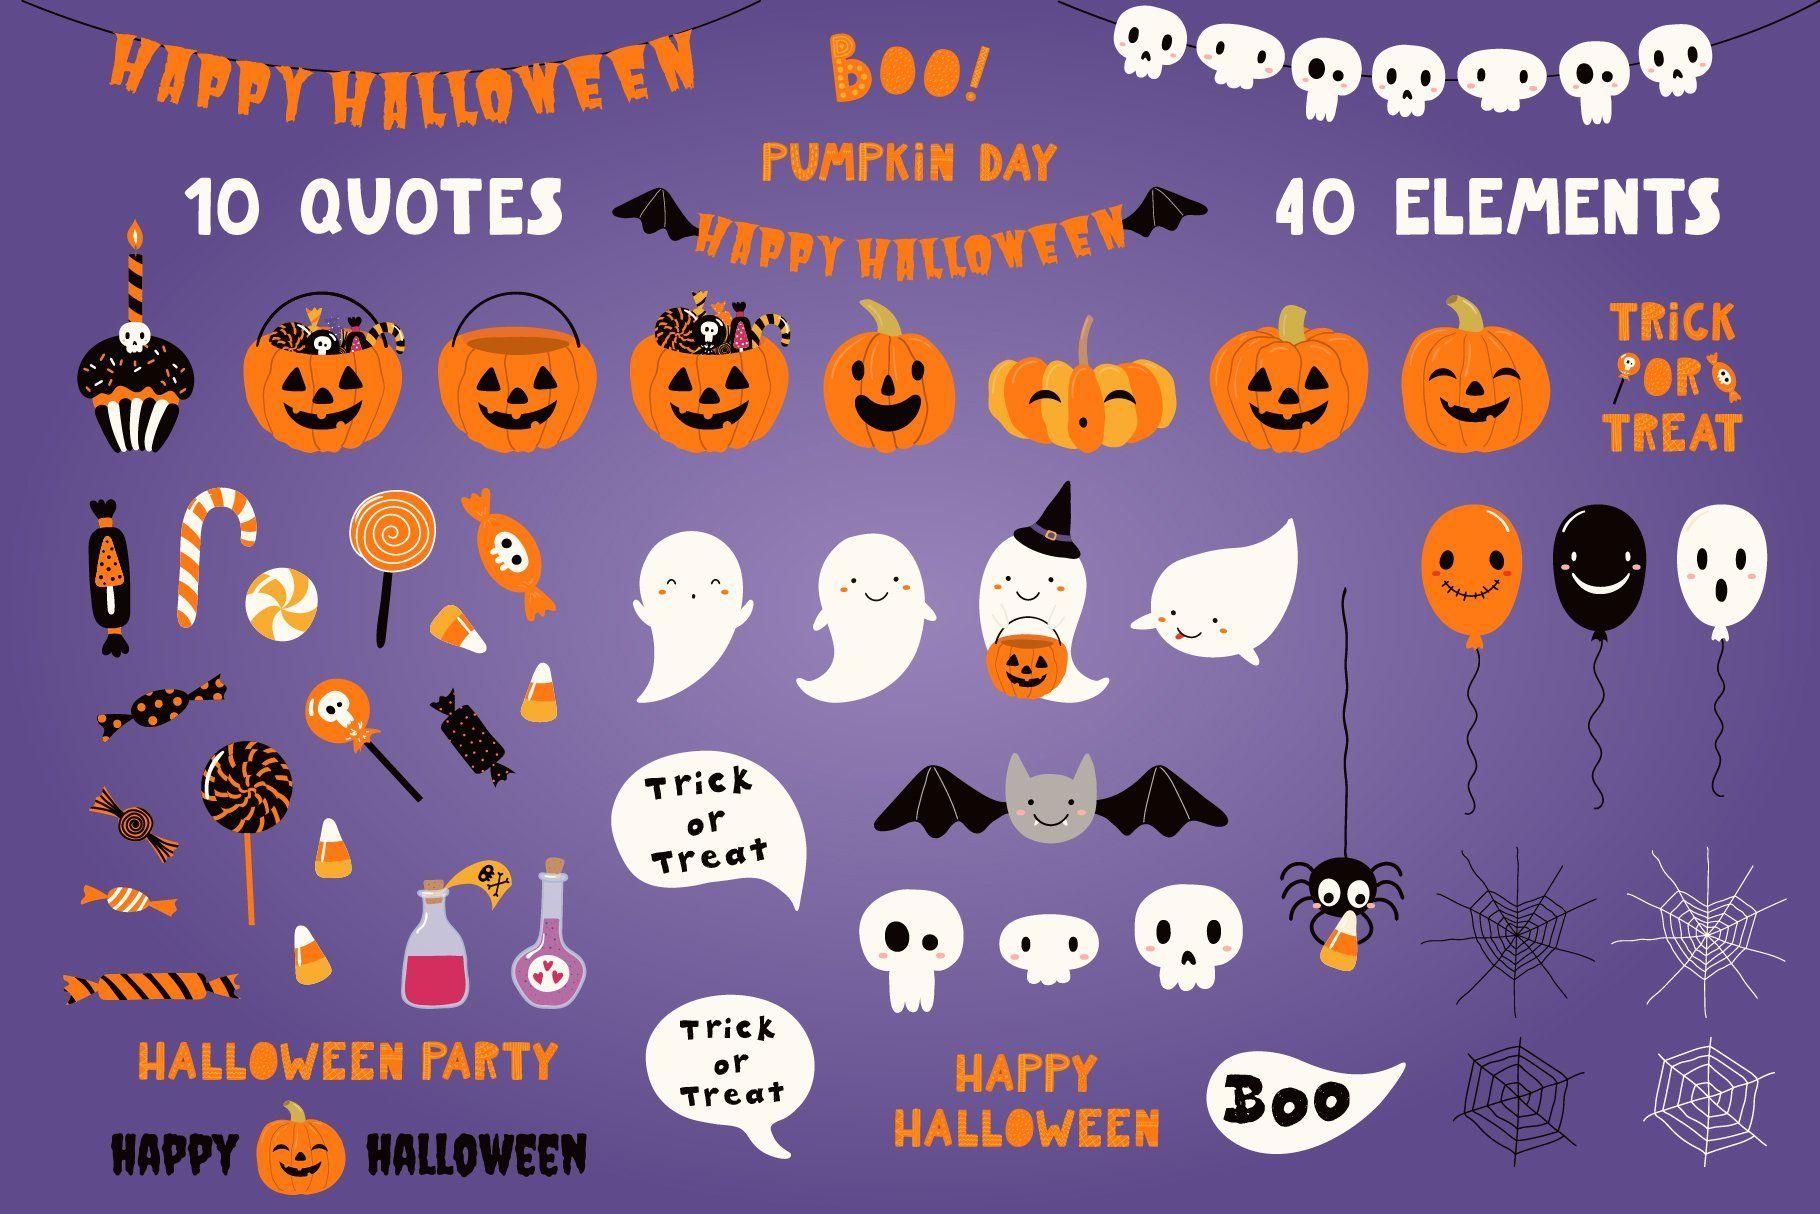 Halloween Party Cute Animals Clipart Cute Animal Clipart Animal Clipart Cute Cartoon Animals